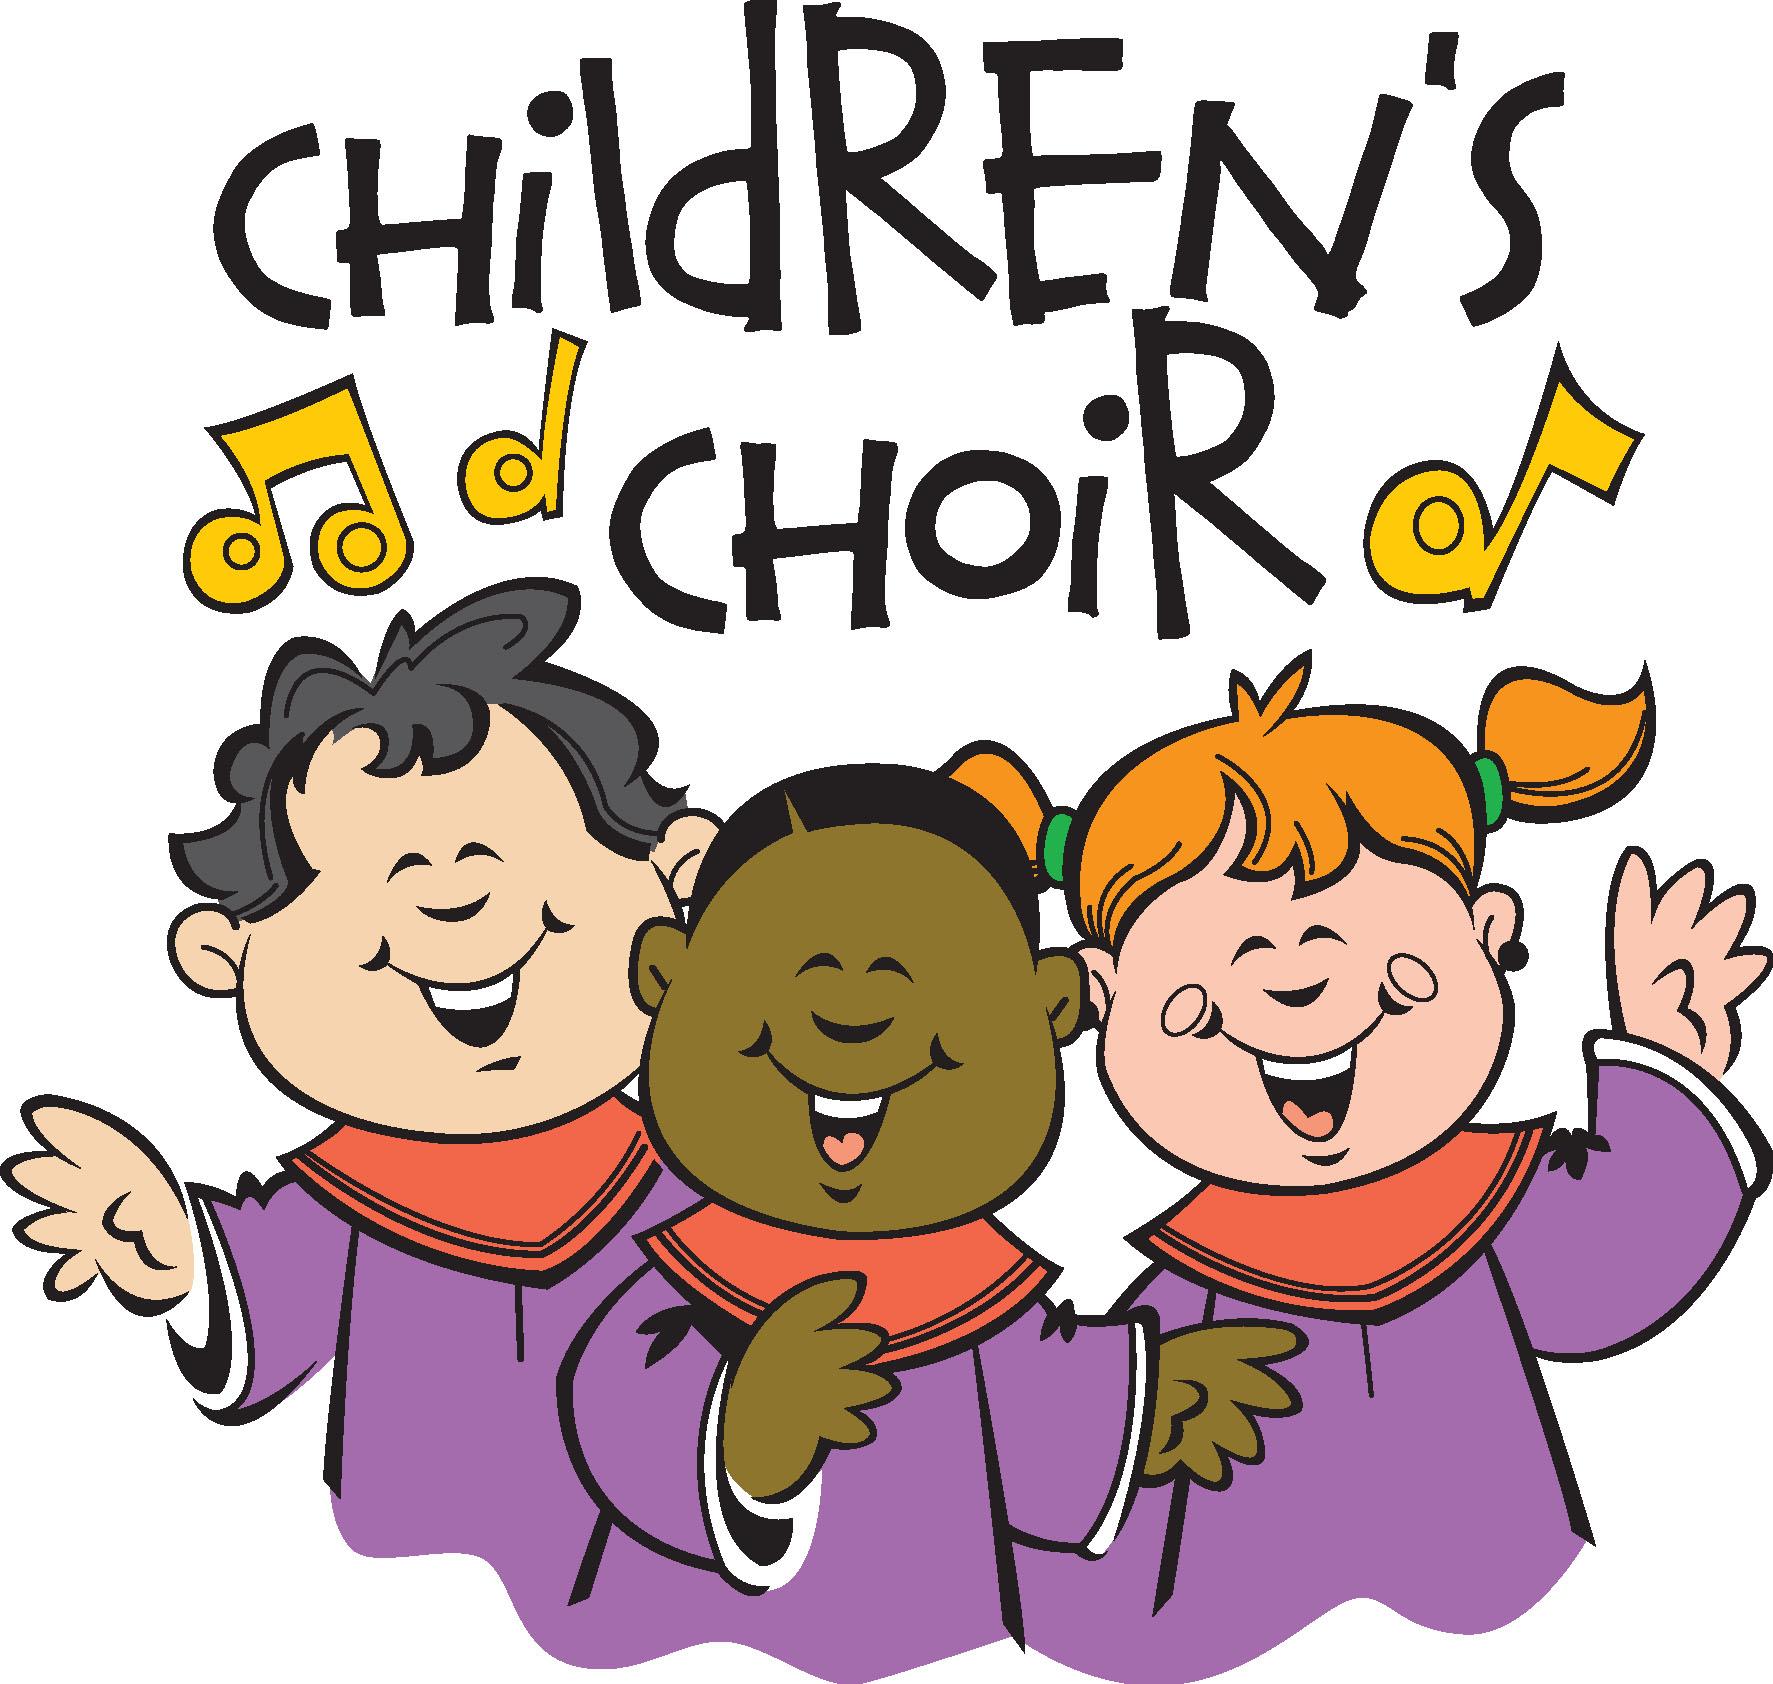 Free Black Choir Cliparts, Download Free Clip Art, Free ...